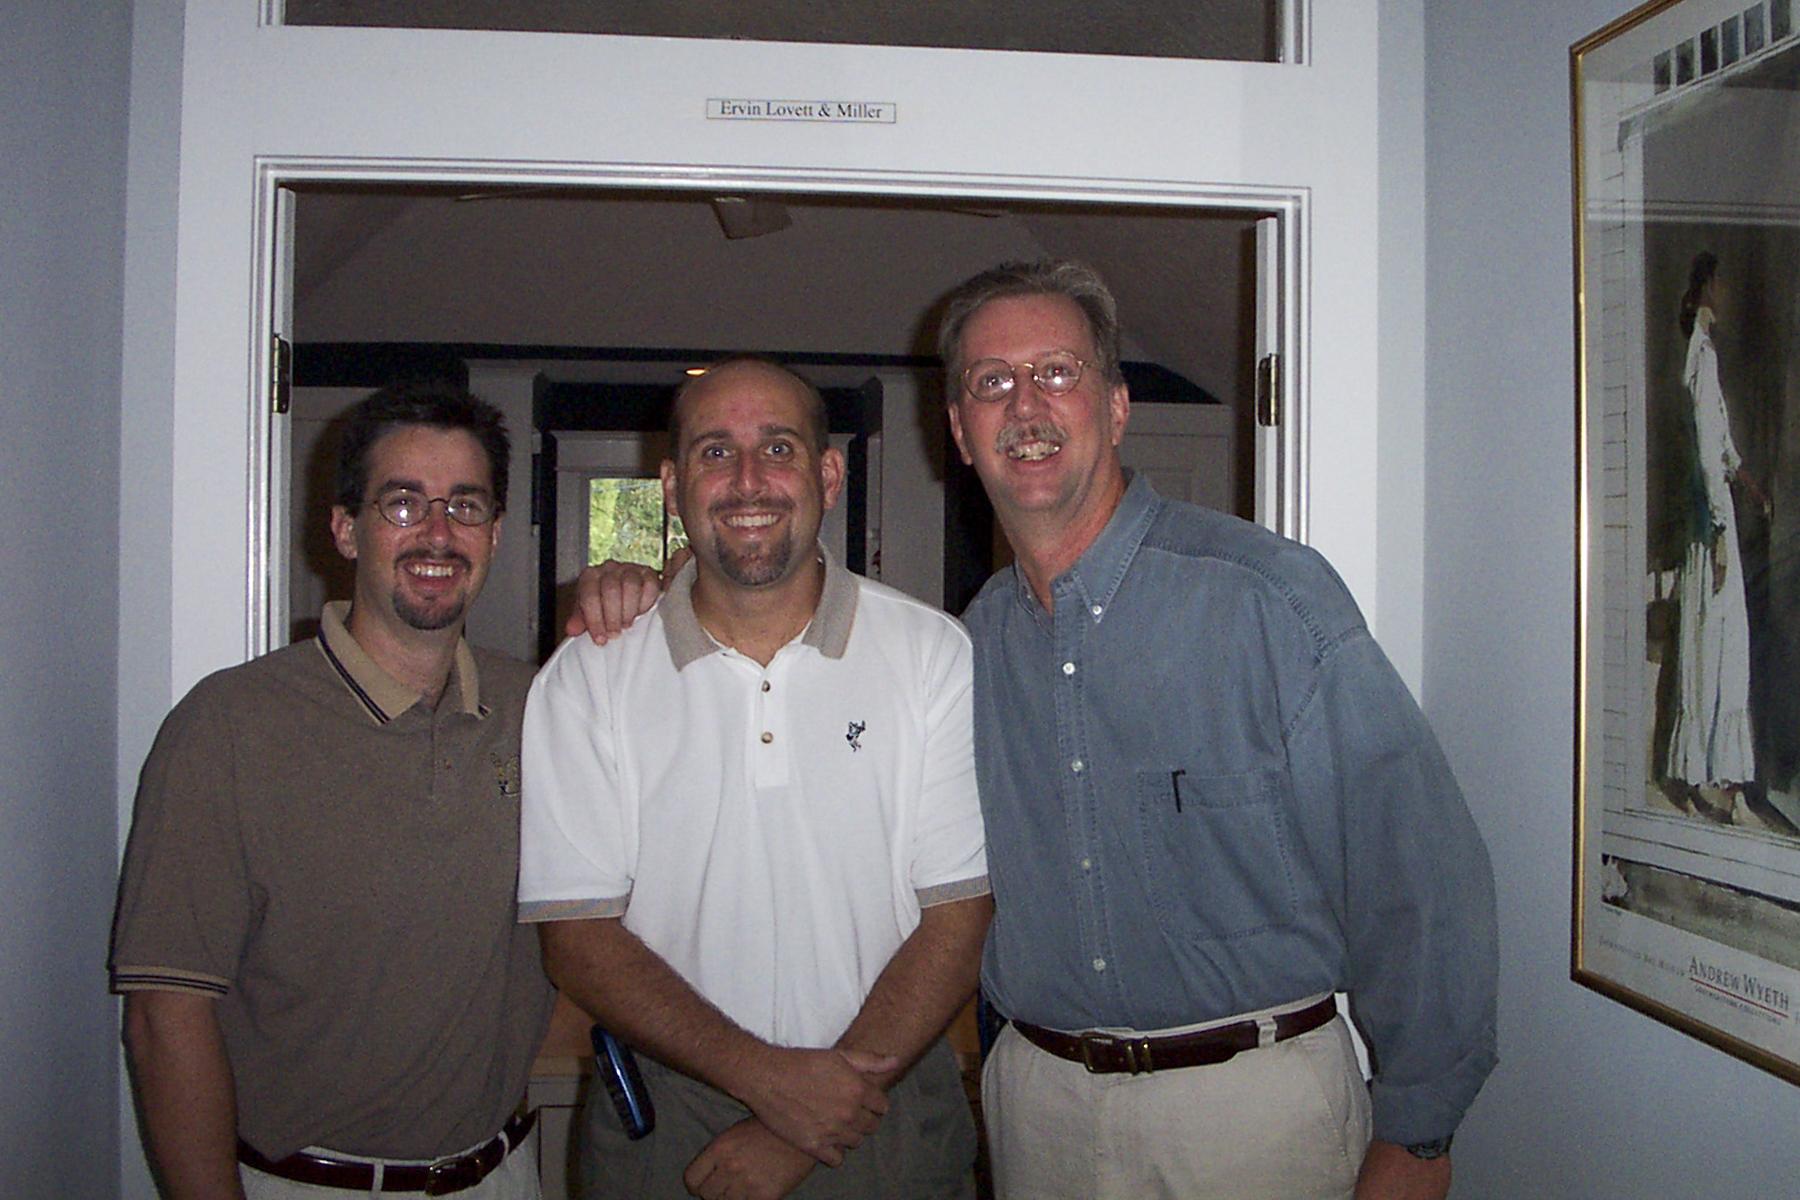 Russ Ervin, Tim Miller and Steve Lovett in 2001, on ELM's first day in business.